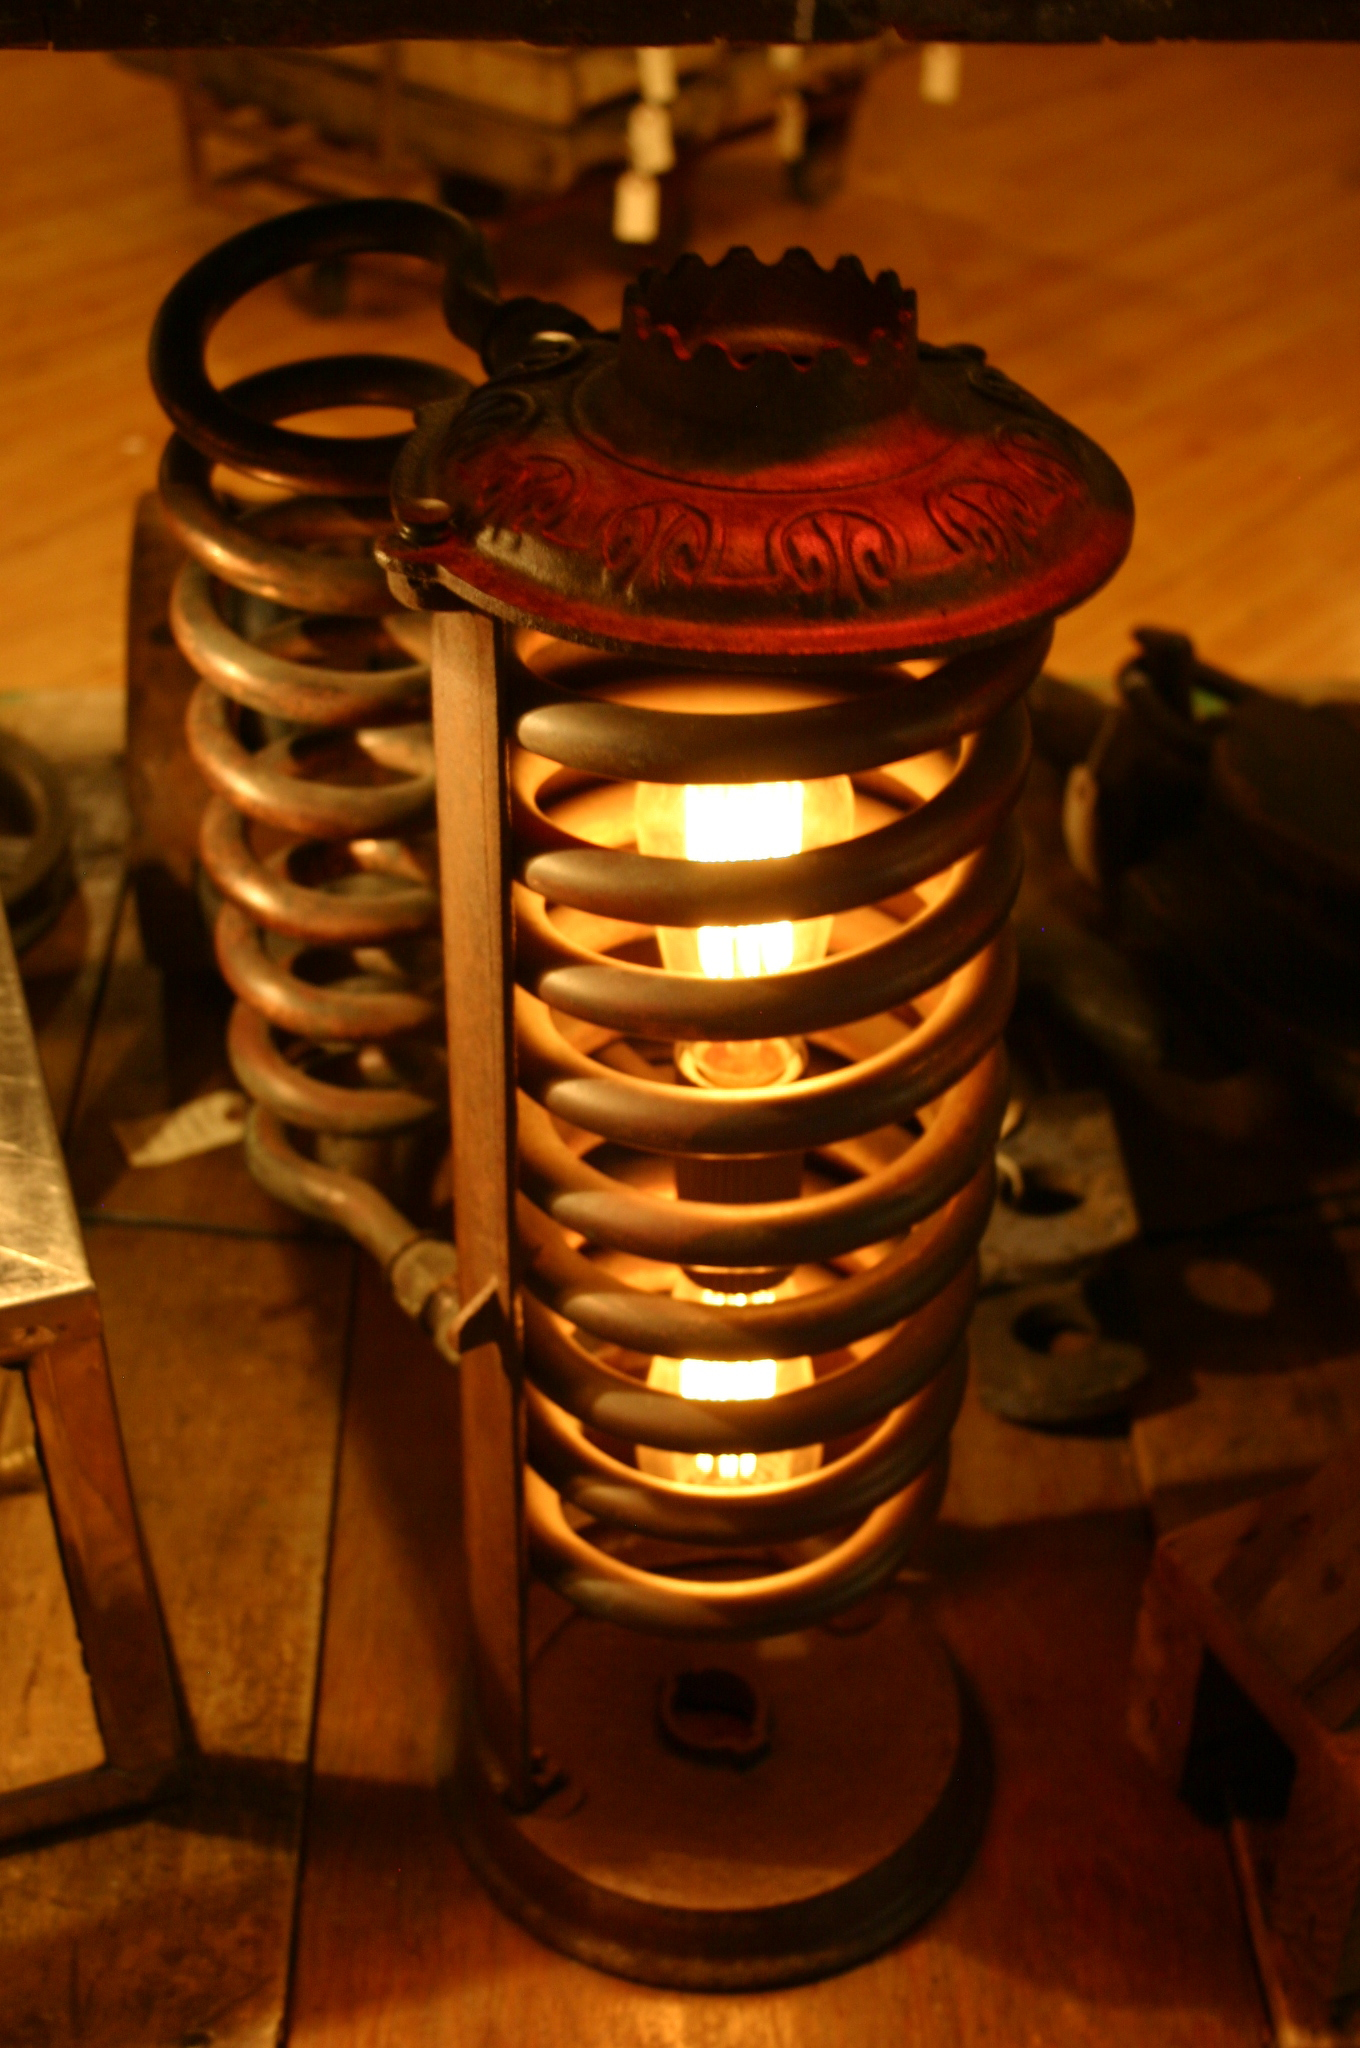 Repurposed Copper Coil Light